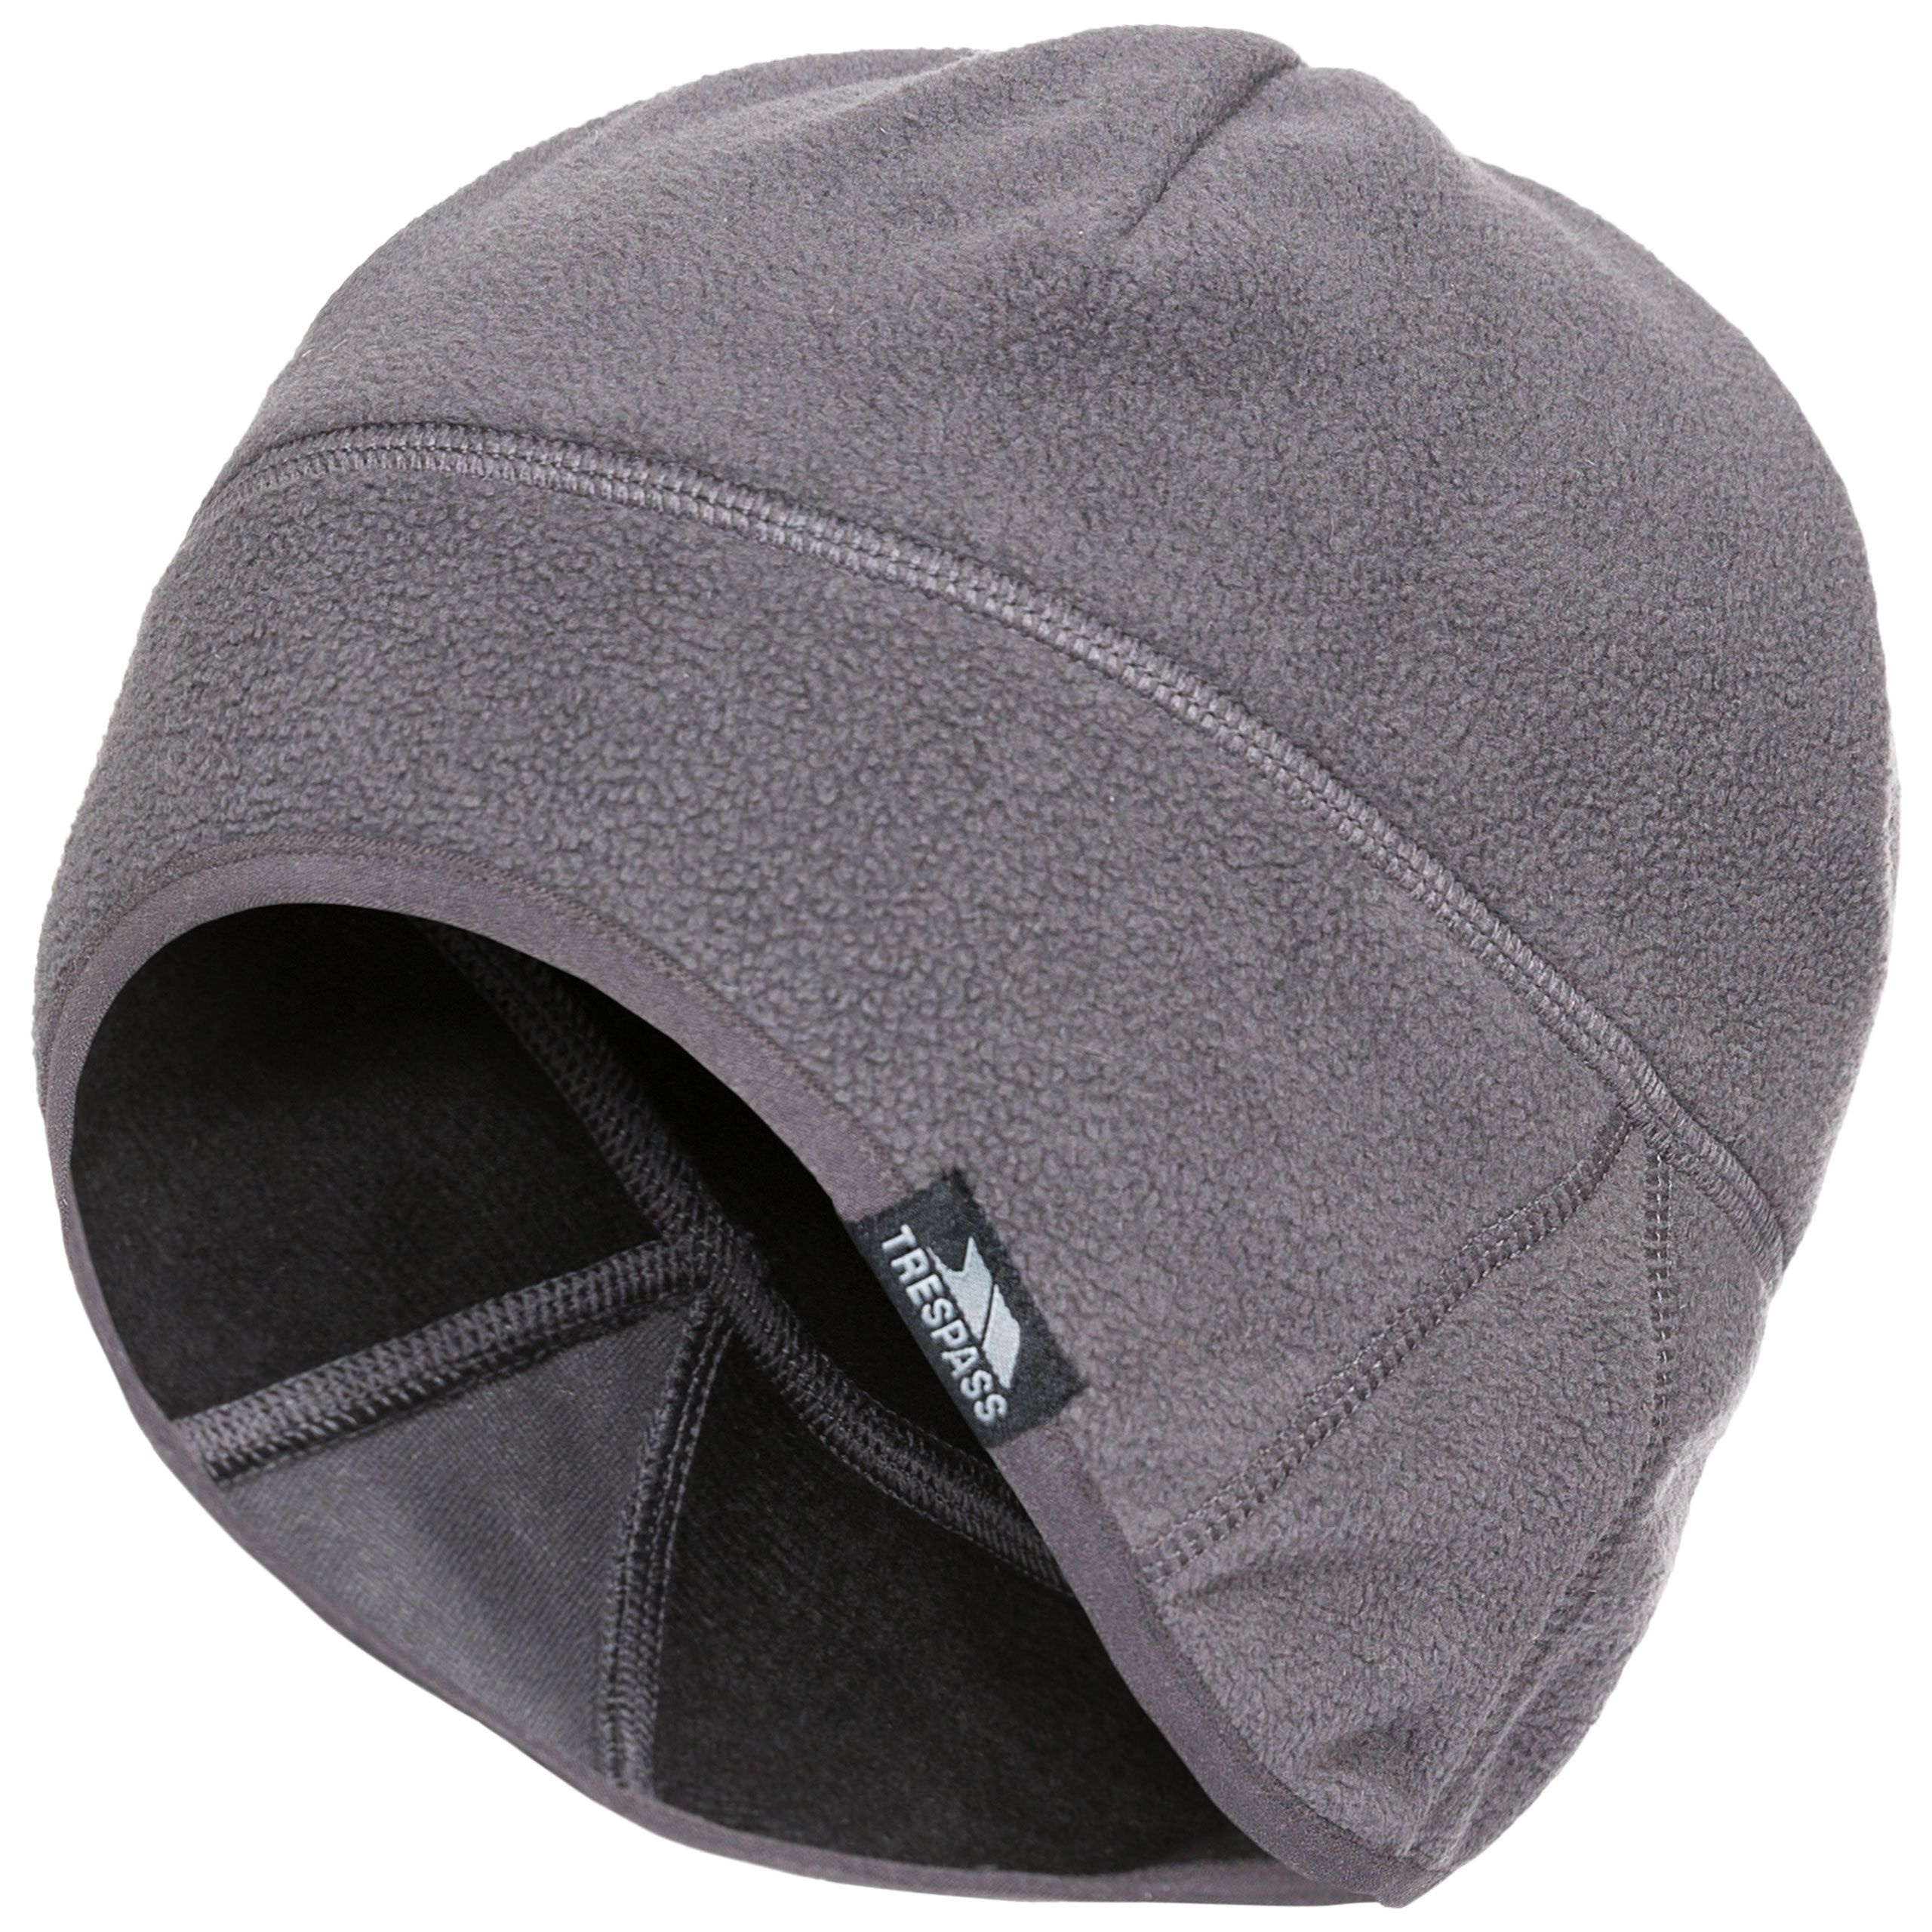 Tomlins Knitted Beanie Hat